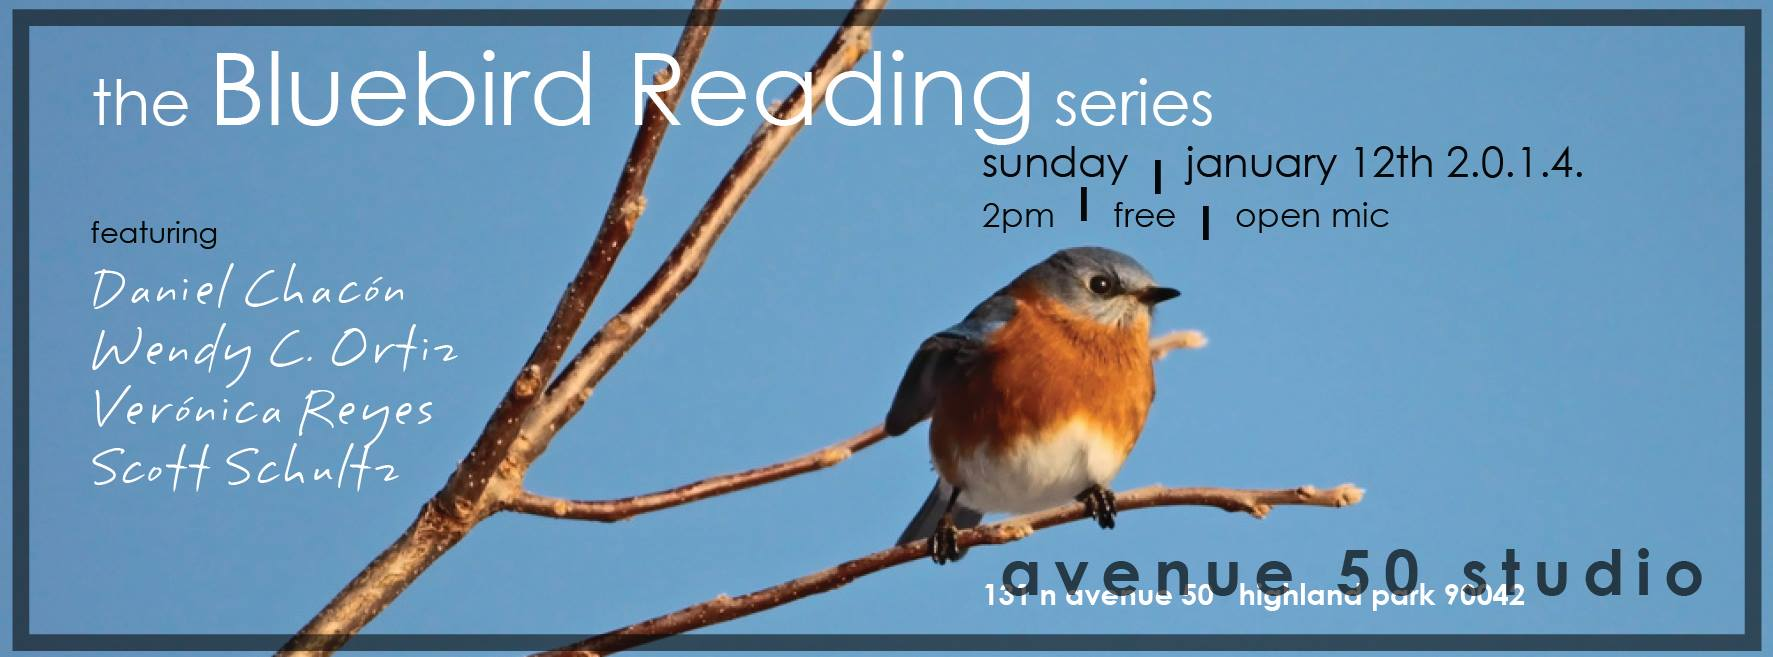 Bluebird reading series avenue 50 studio feb 9 bluebird 152335410152124256461054176618325o biocorpaavc